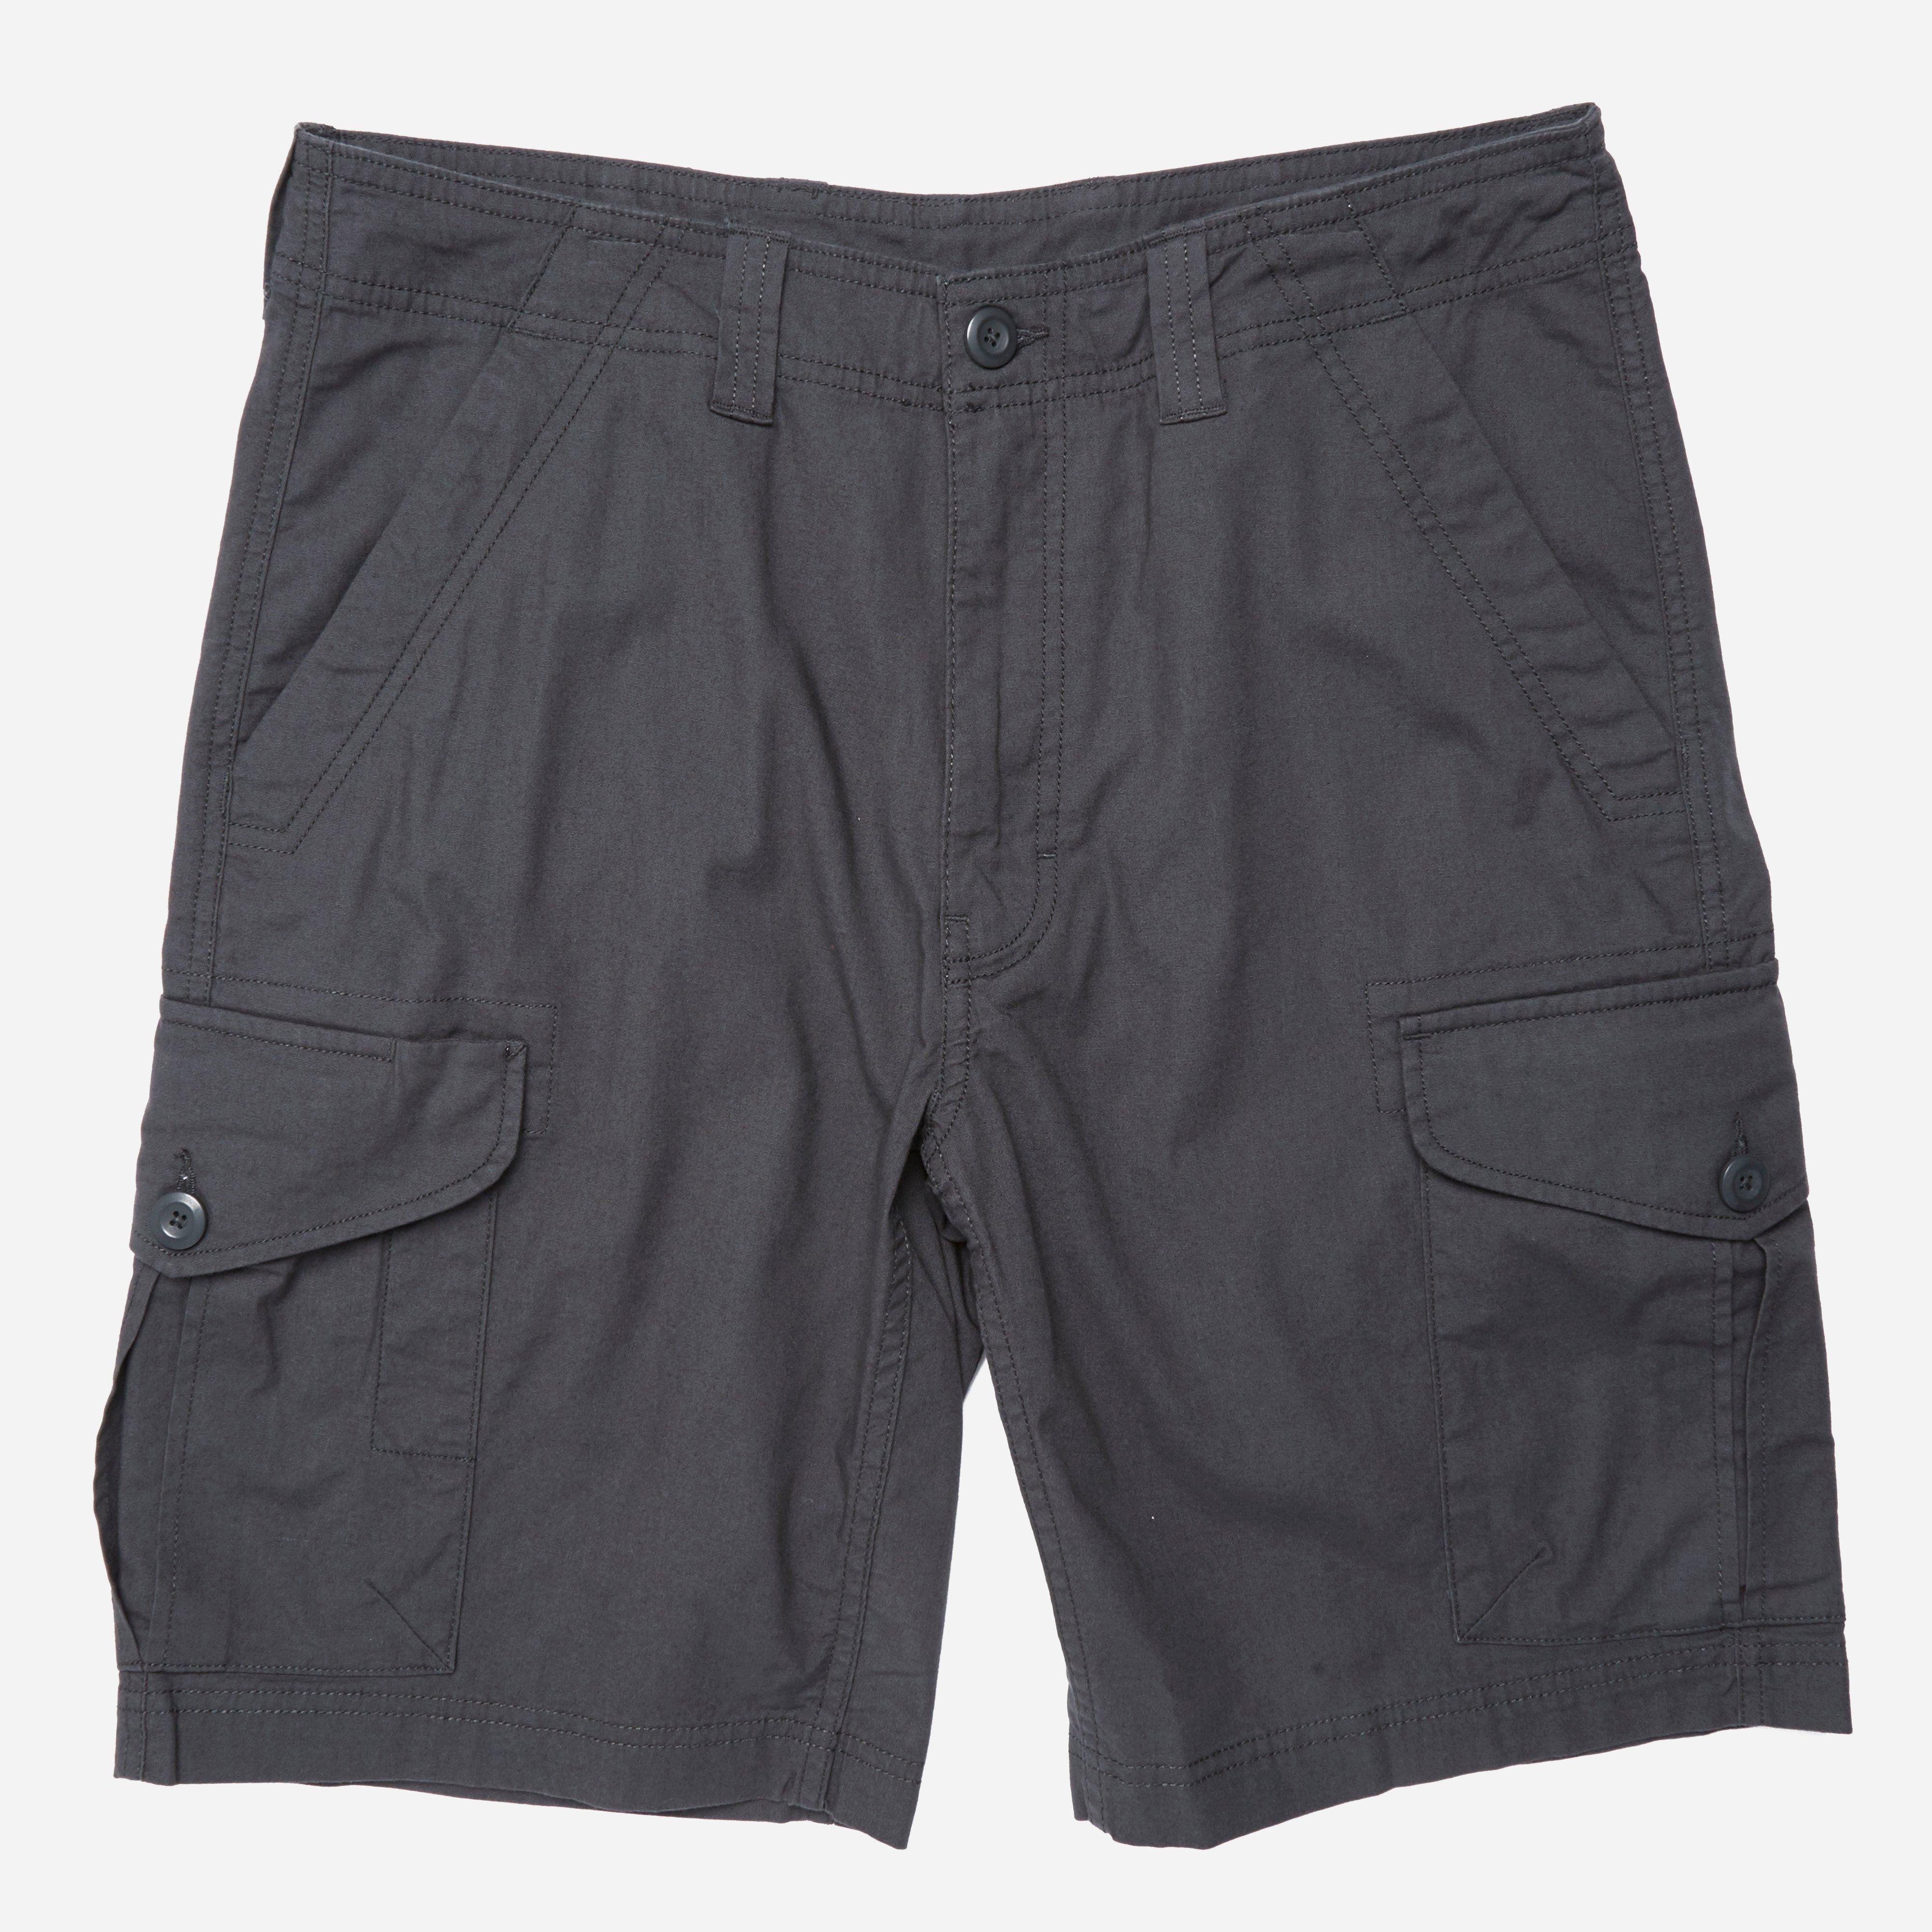 "Patagonia All Wear 10"" Cargo Shorts"